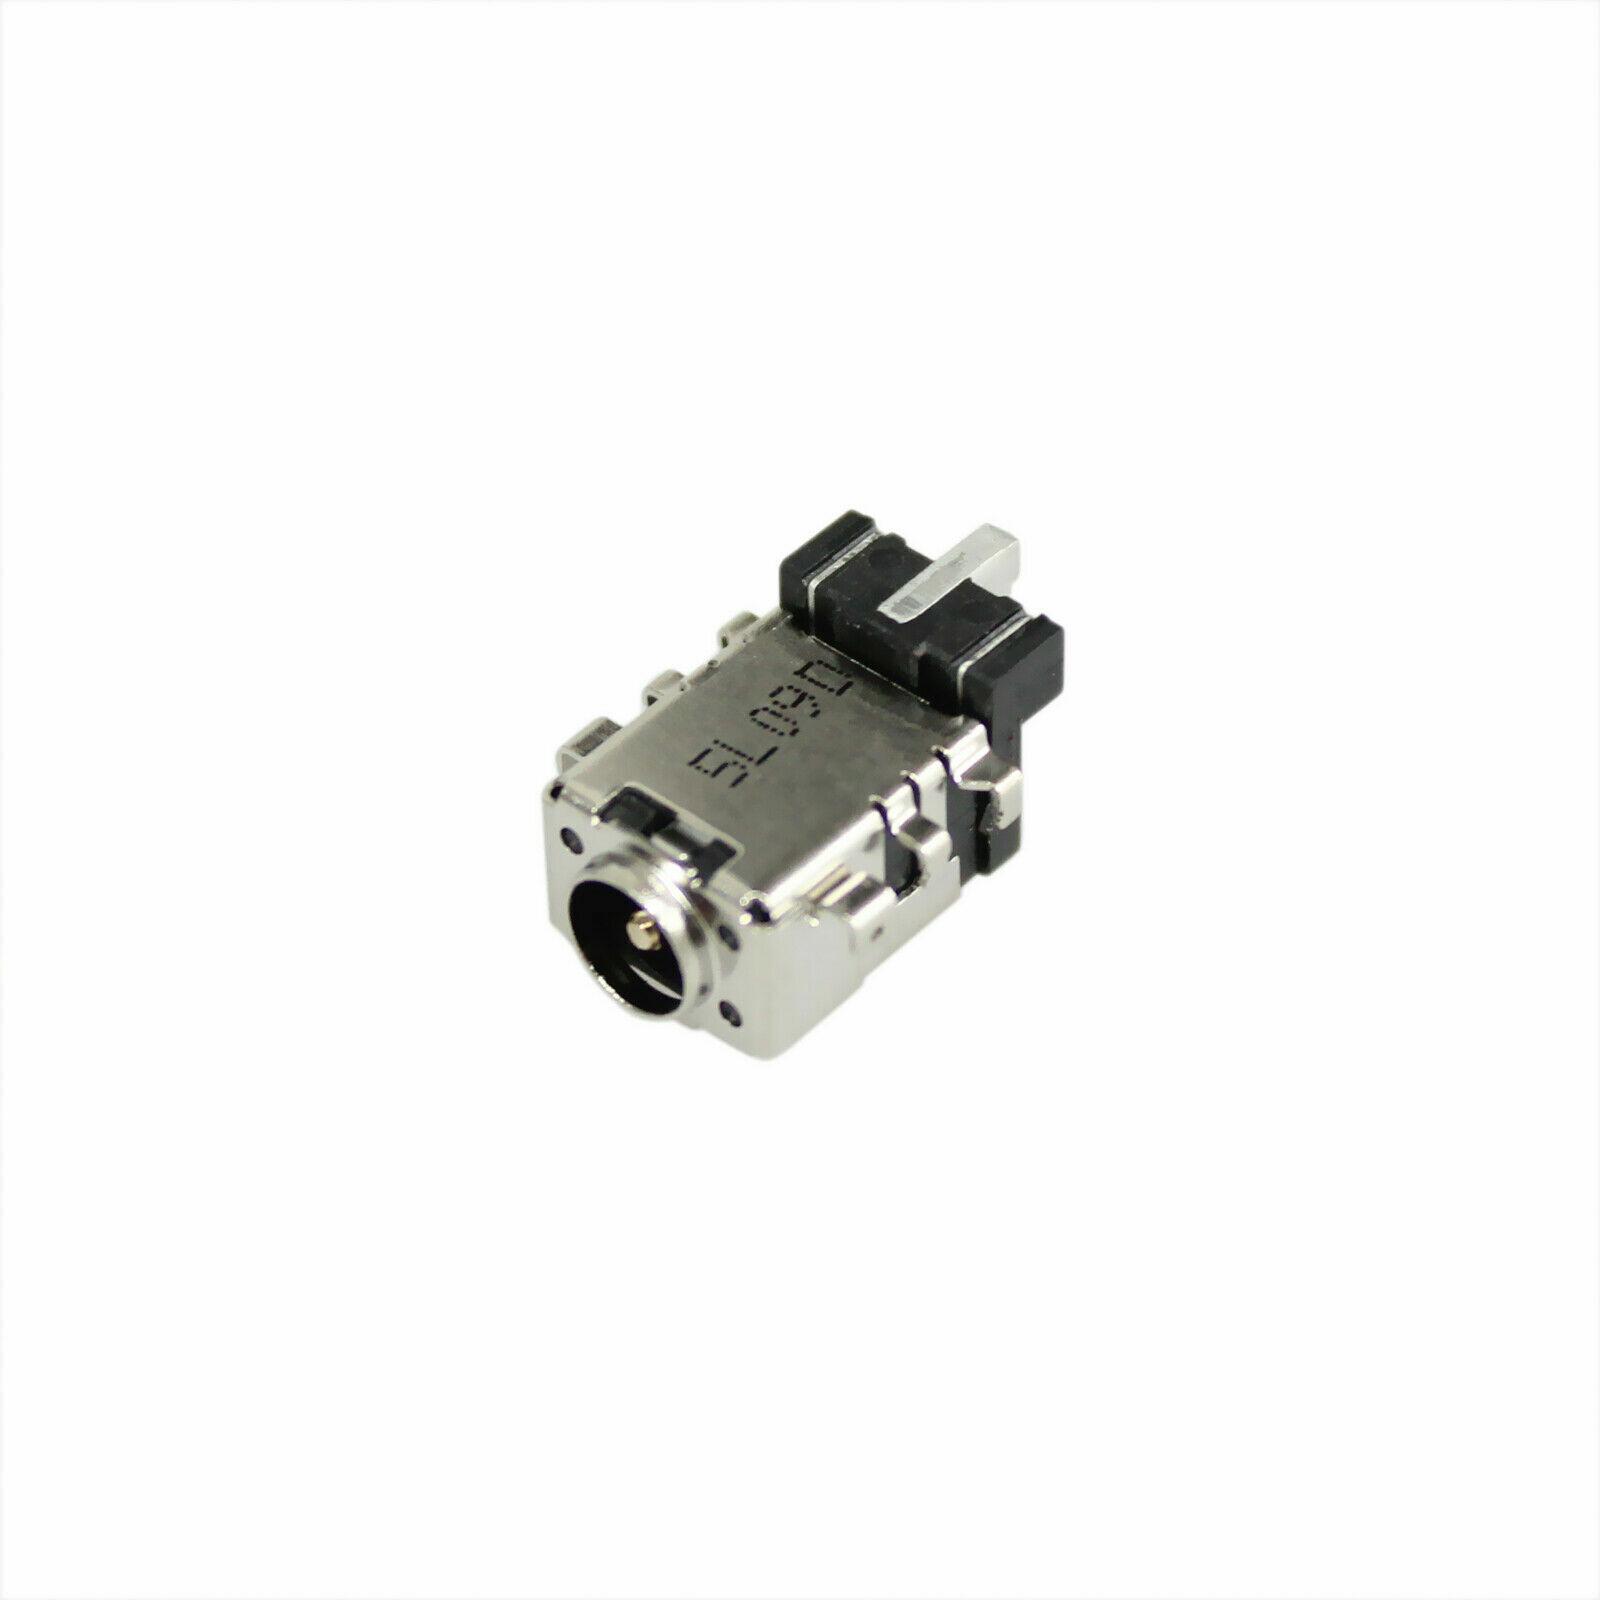 Replacement DC Socket Power Jack Port Connector - Asus Vivobook R542 Series usjp